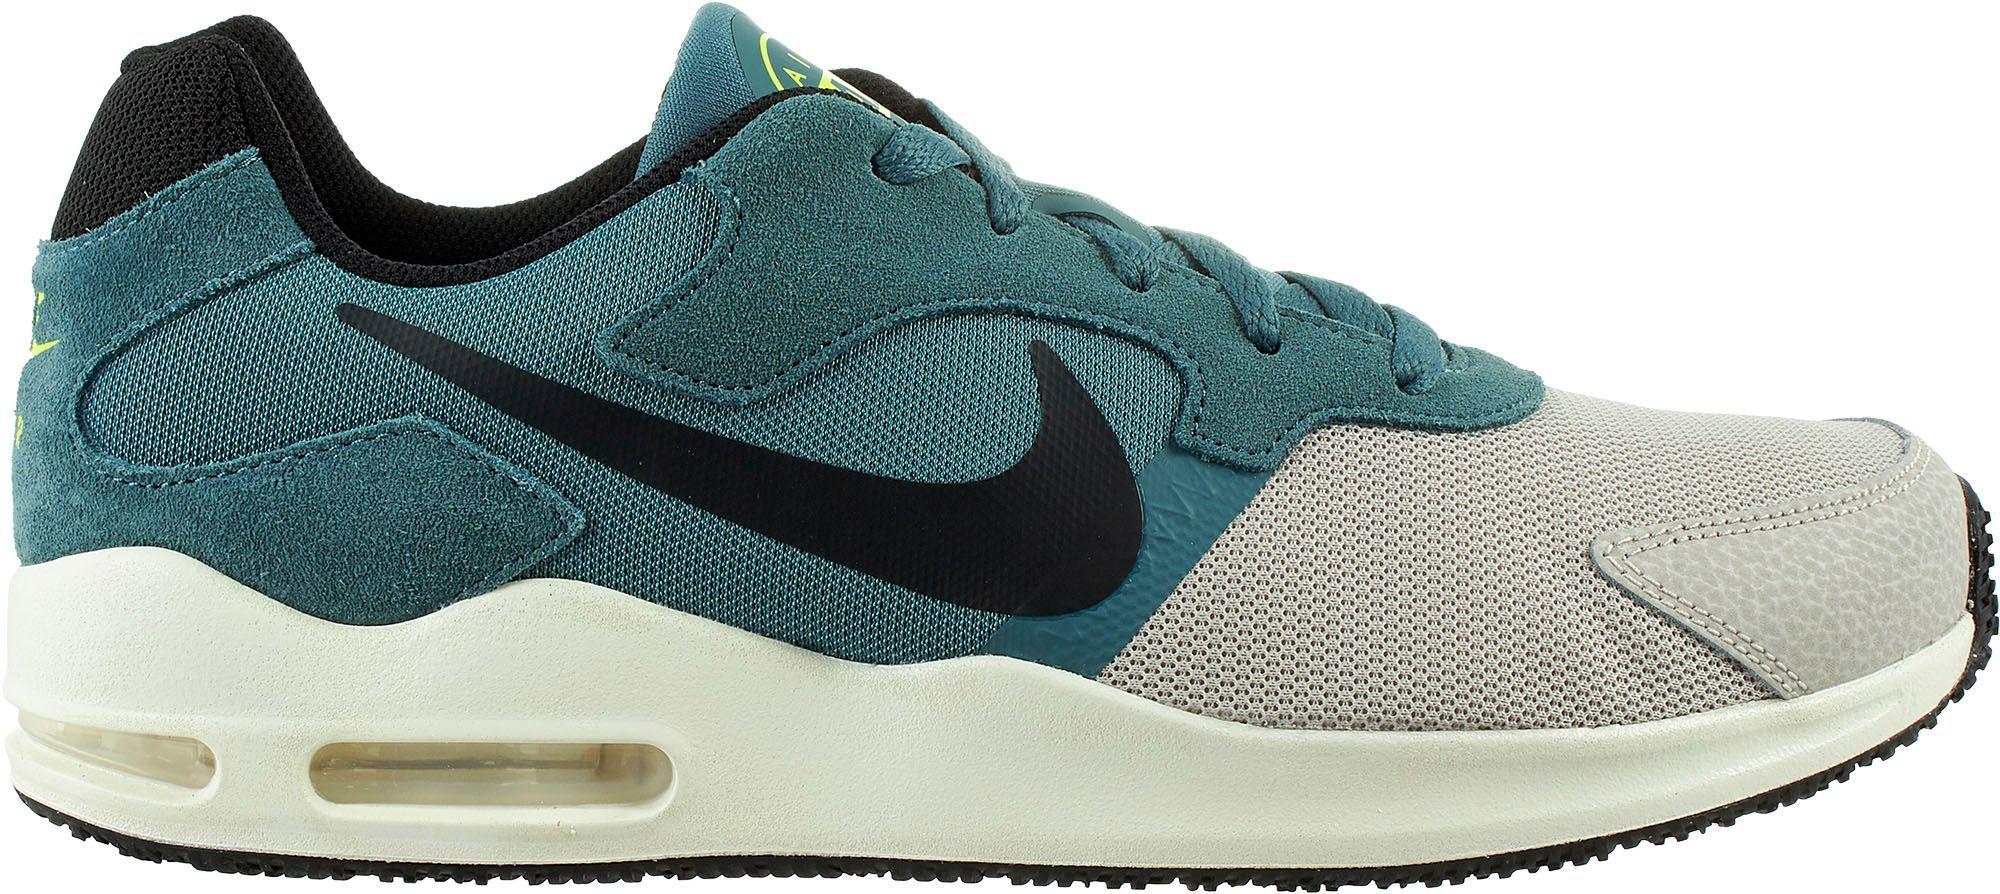 875481e1225 Nike Men s Air Max Guile Shoes